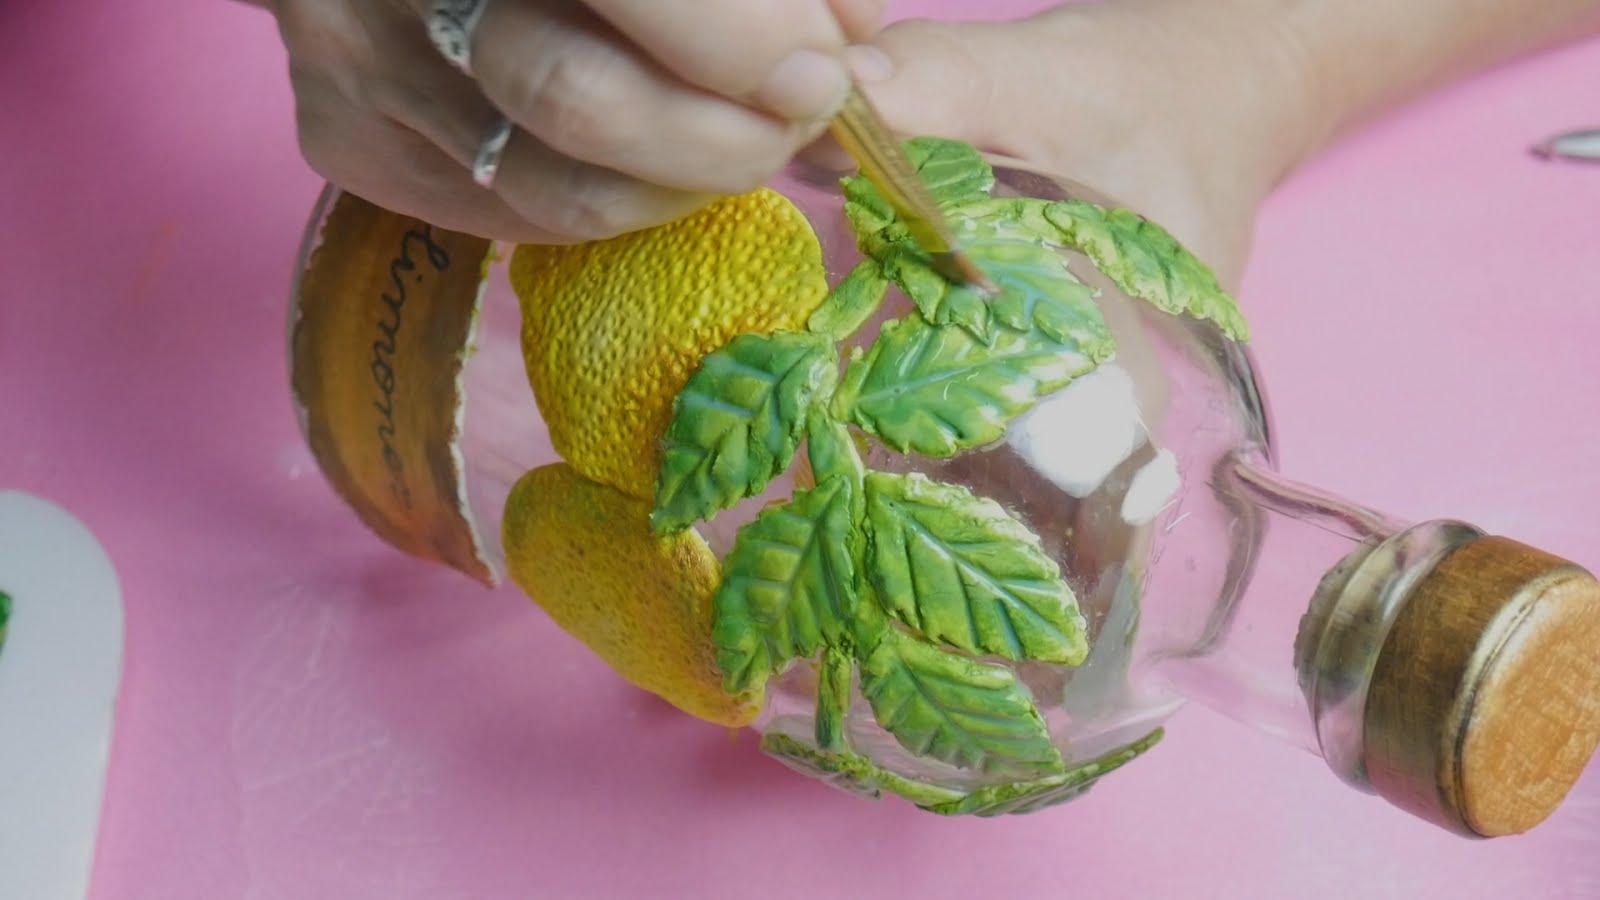 Increíble Manicura Uñas Ovaladas Composición - Ideas de Pintar de ...